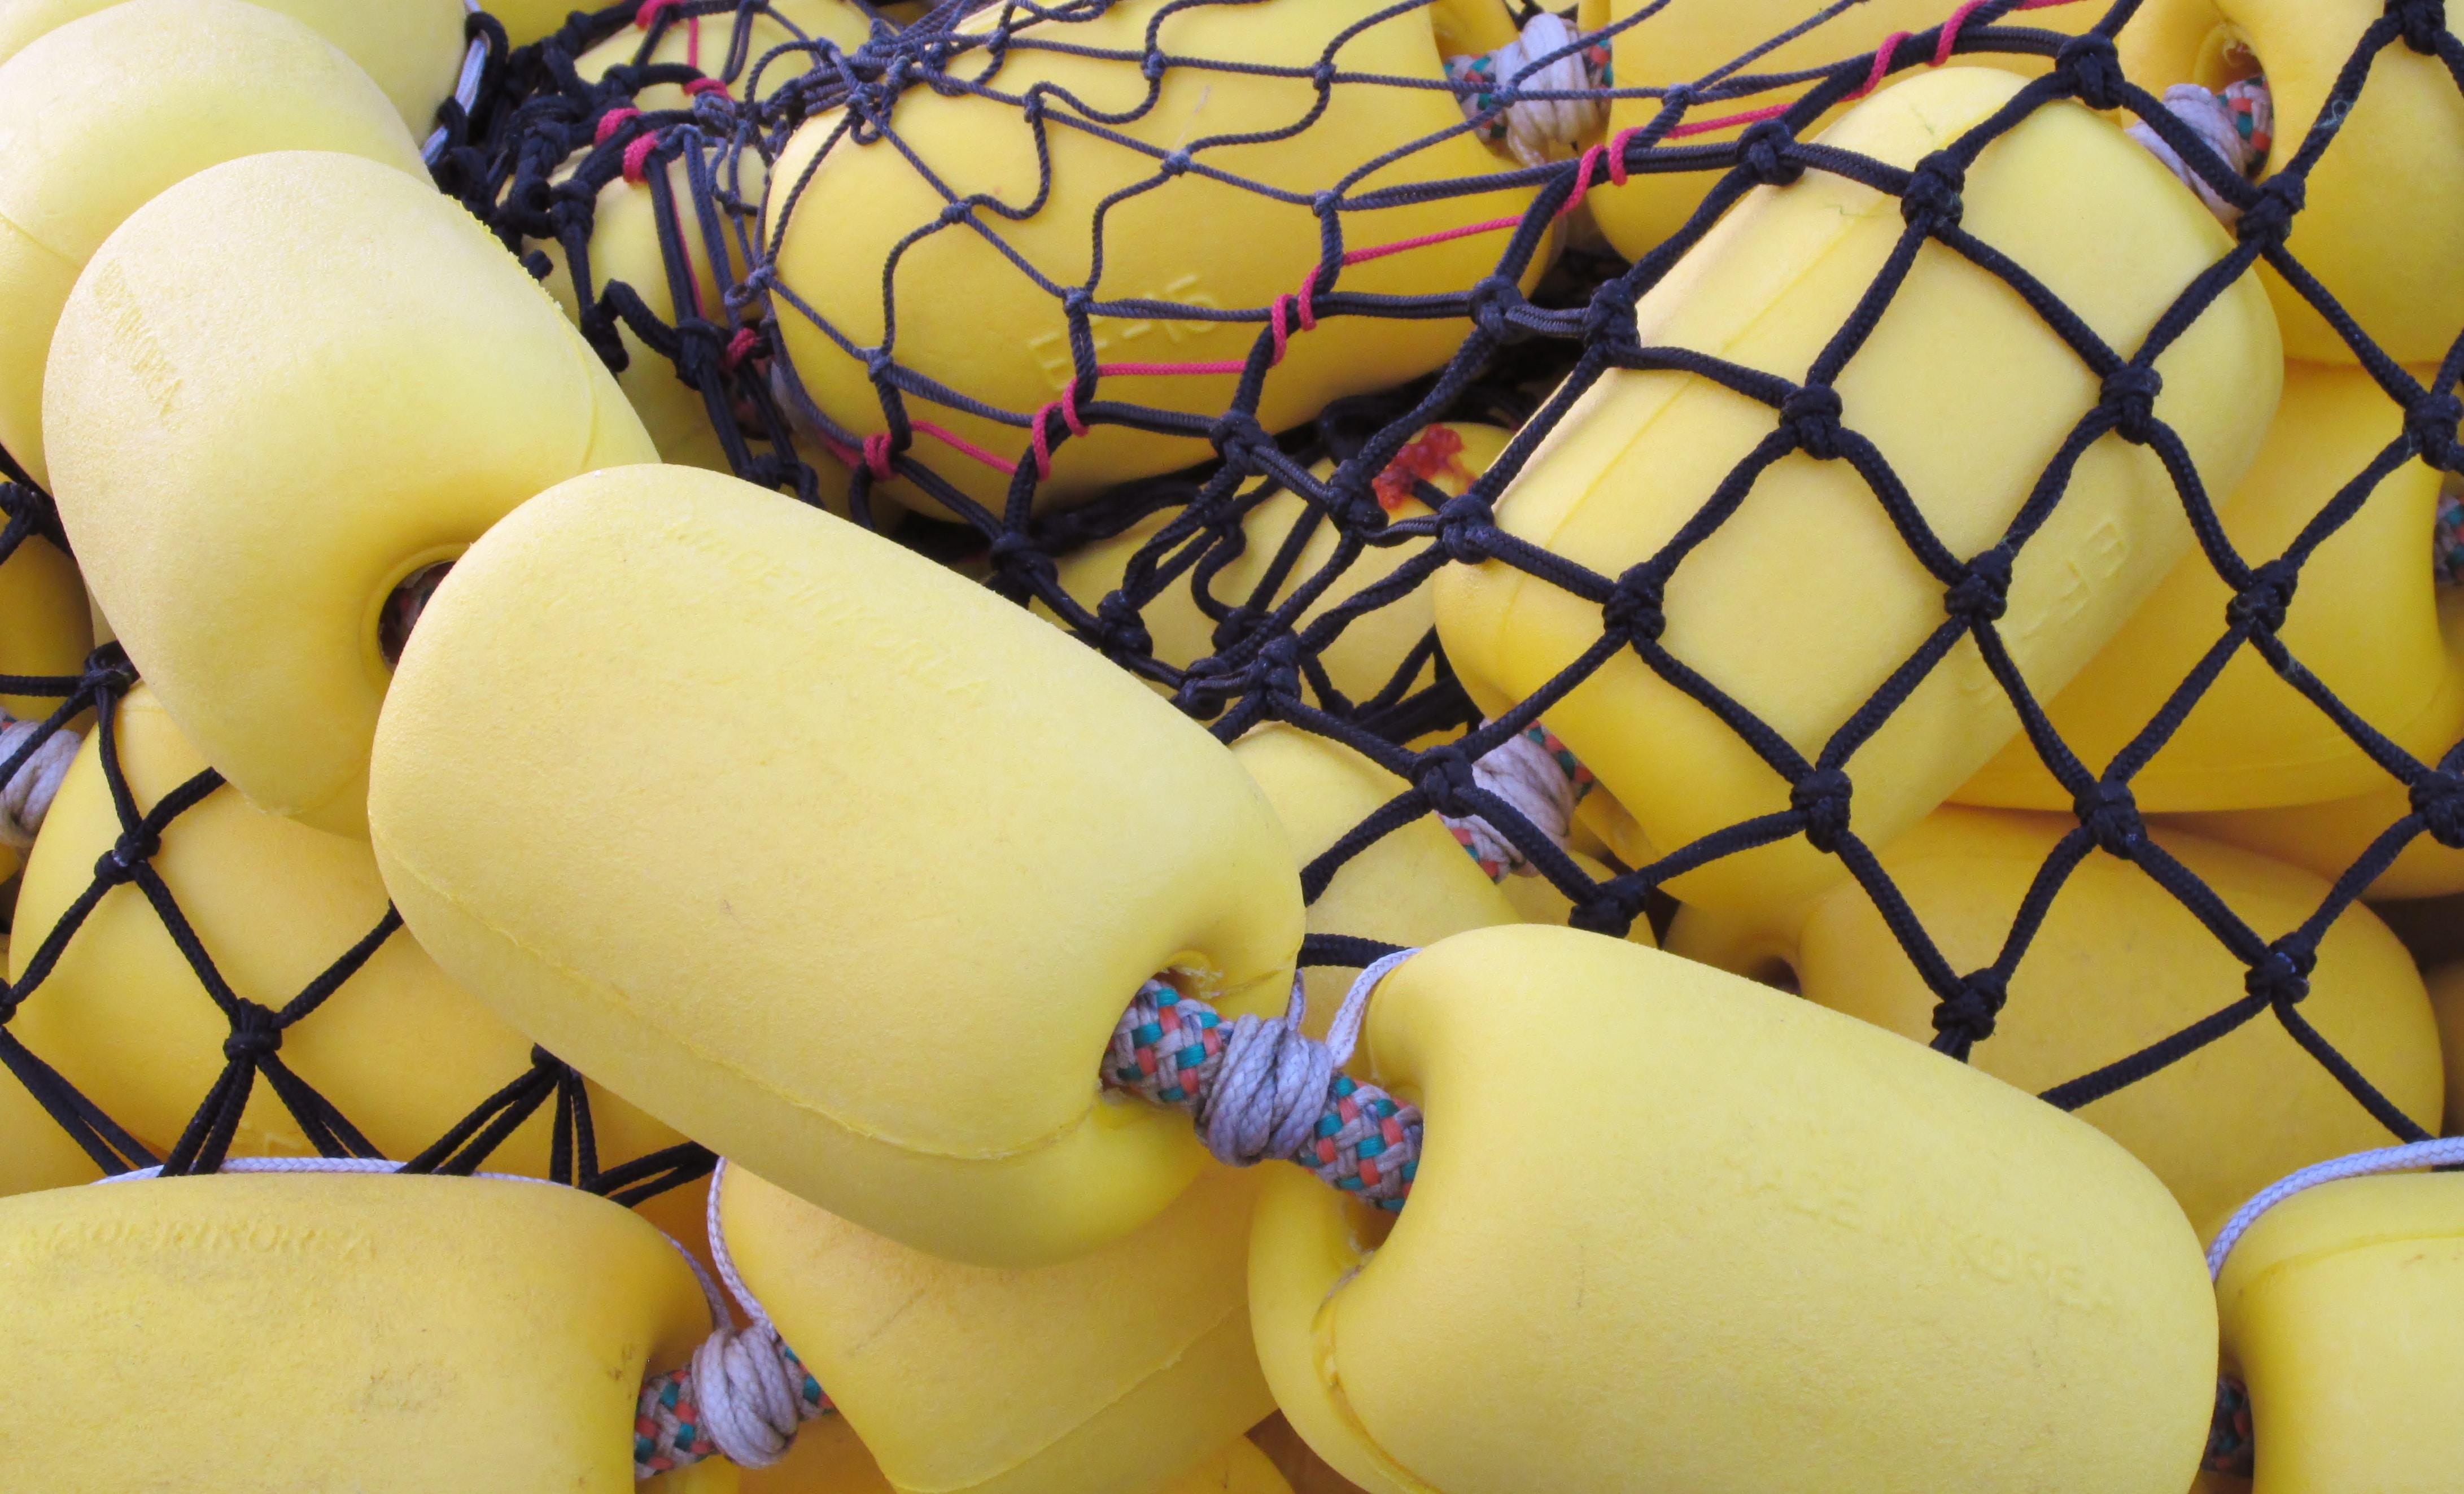 closeup photo yellow sponge with black net